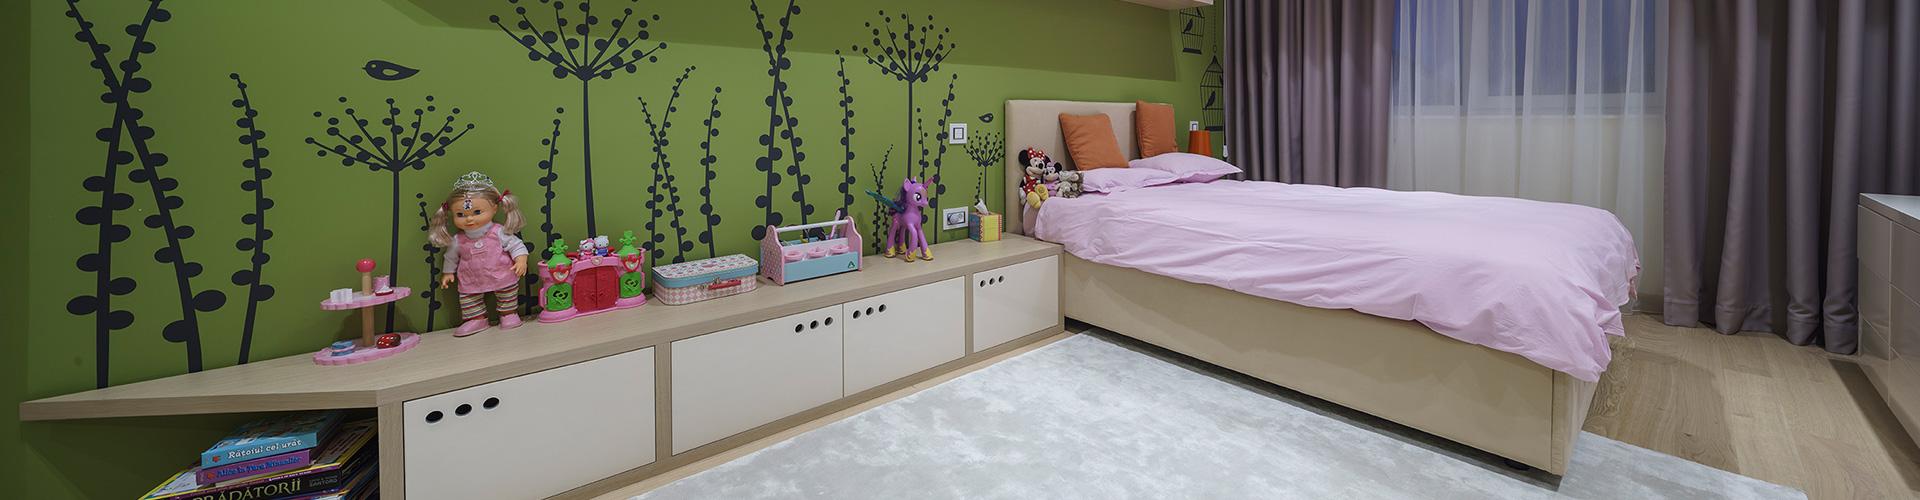 Спальни на заказ в Кишинёве